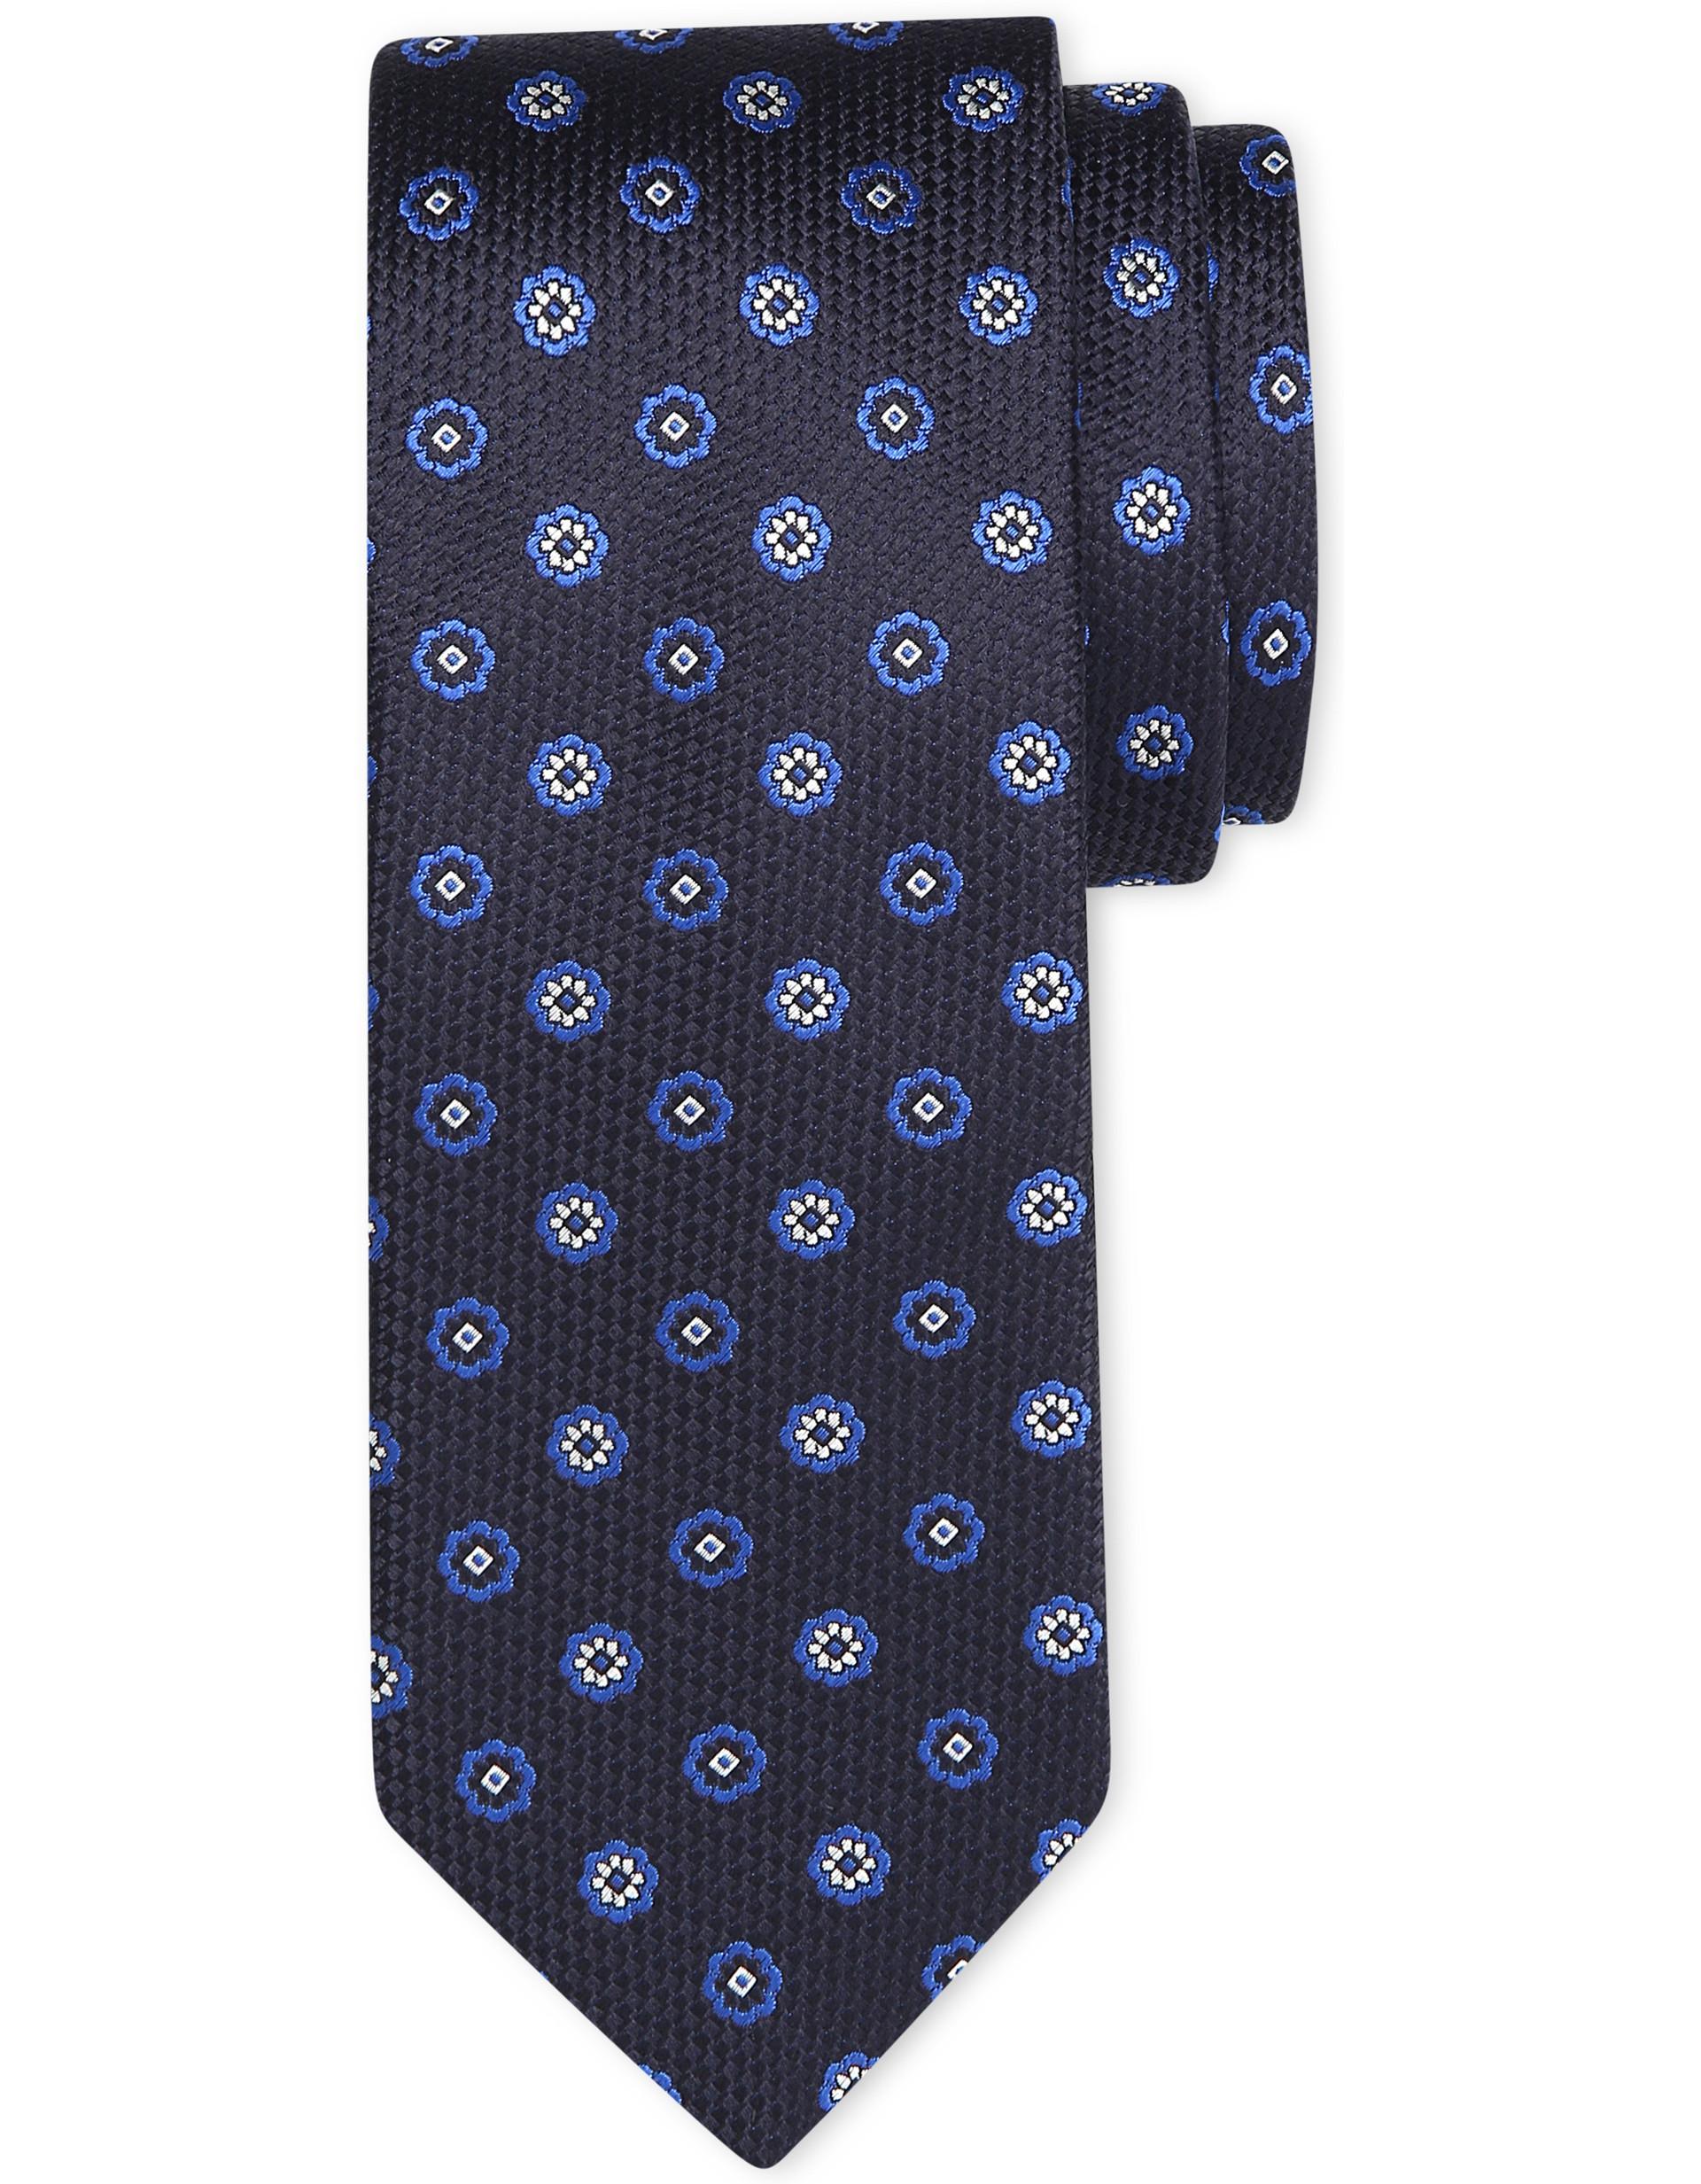 e7b3cd097078 Canali Dark Blue Tie With Floral Ornamental Motif In Pure Silk in ...